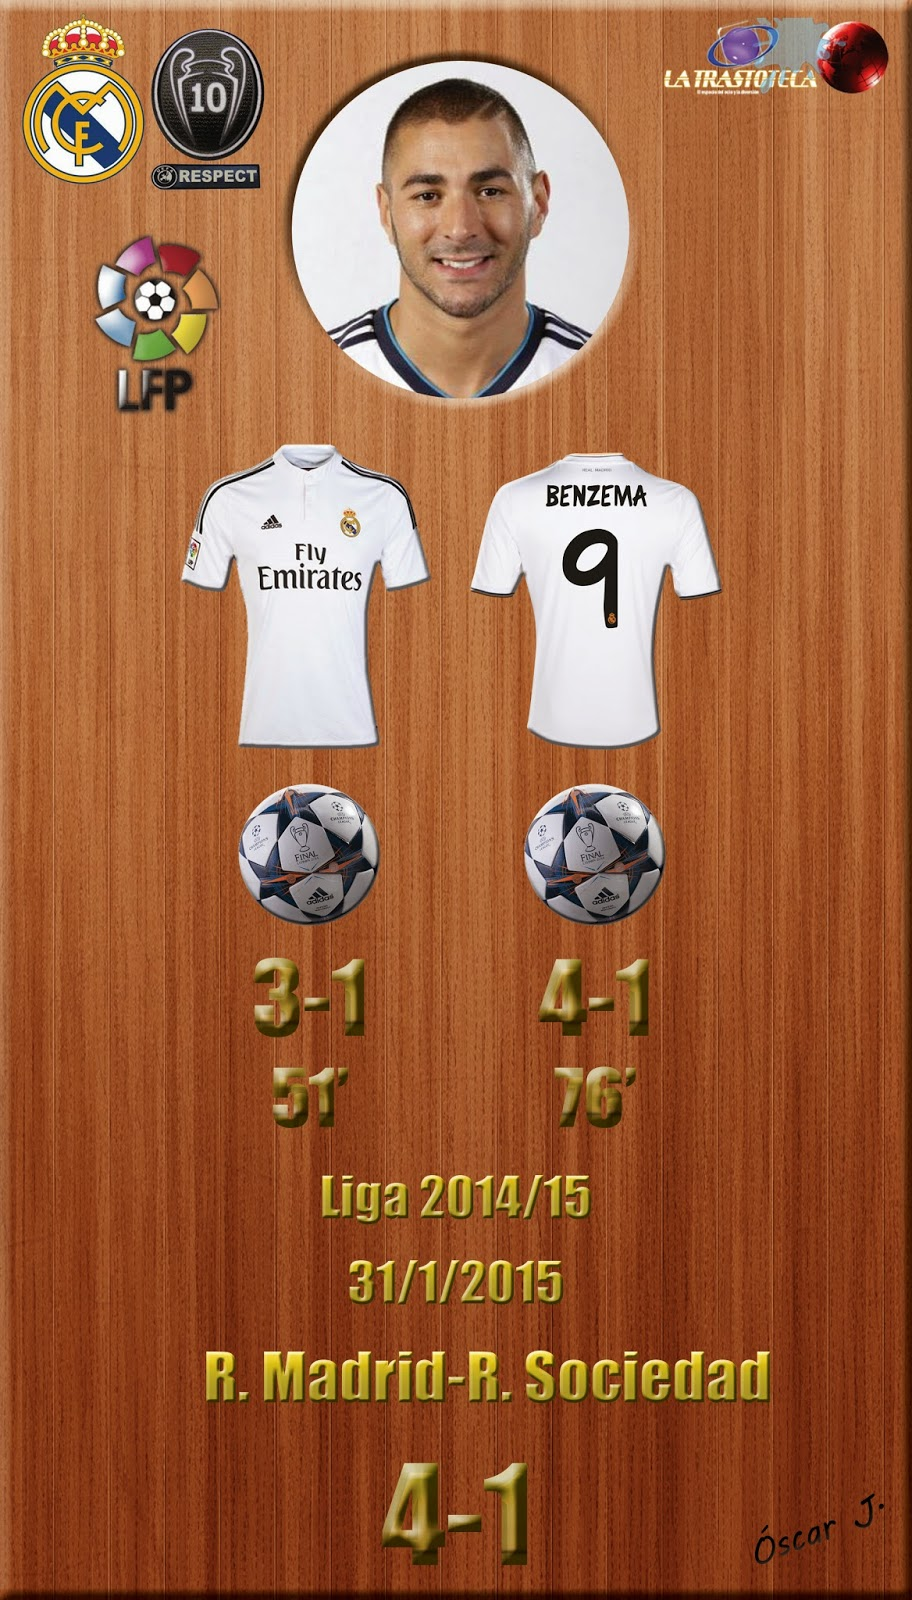 Real Madrid 4-1 Real Sociedad - Liga 2014/15 - Jornada 21 - (31/1/2015)